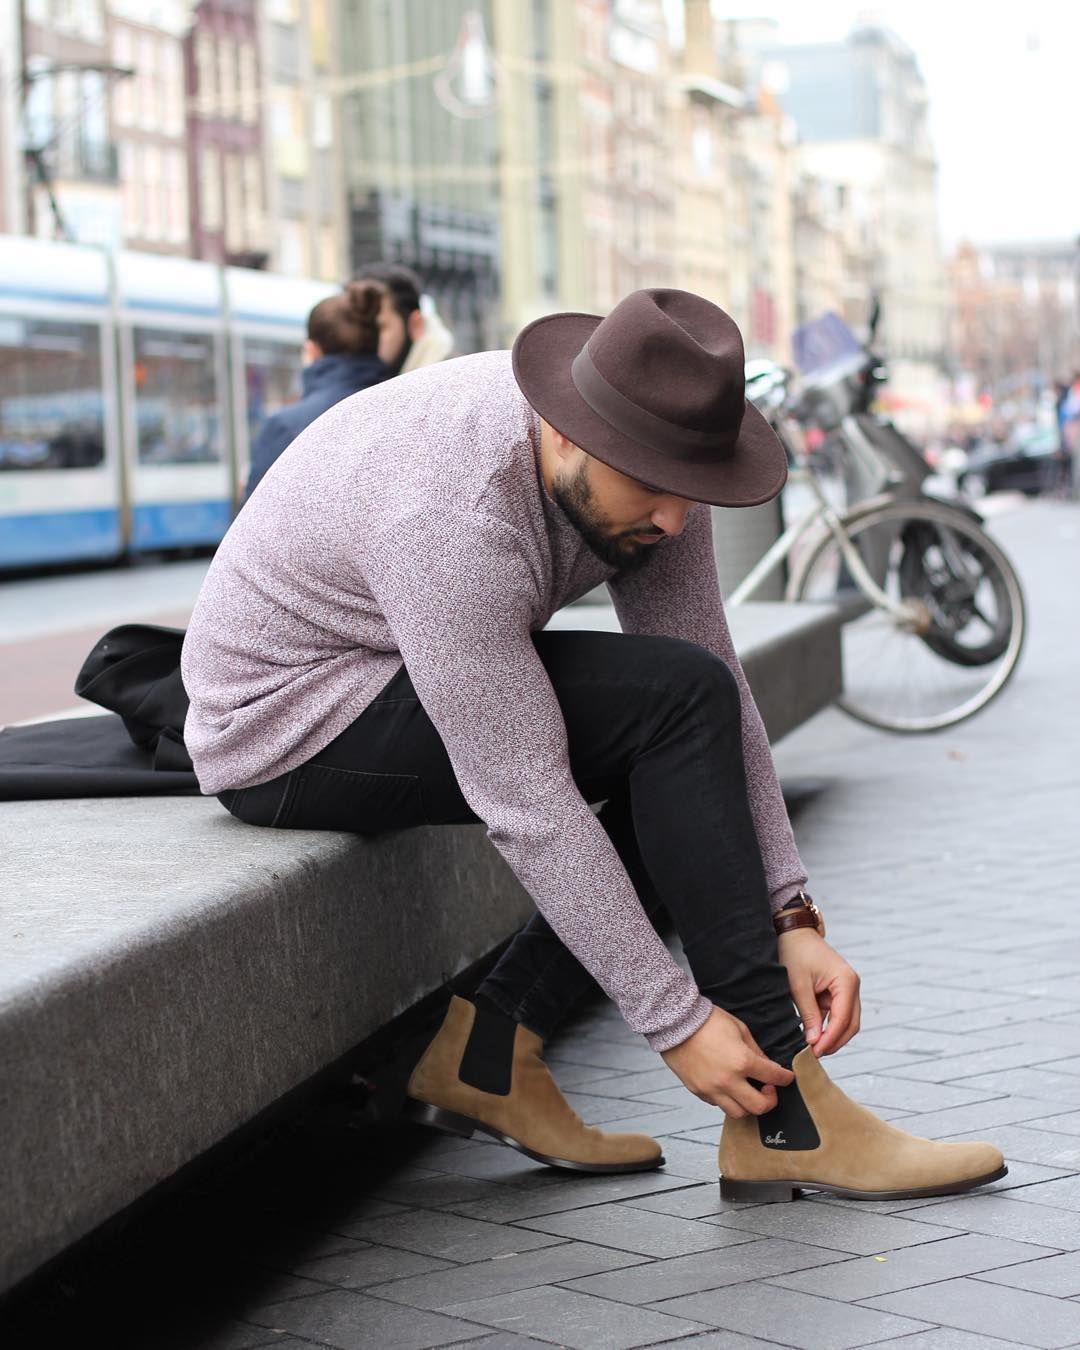 Take it Easy _______________ Sweater: @adpt.official Boots: @serfanmode #adptofficial #adptofficial #serfan #mensfashionreview #style #fashion #blogger #menfashionpost #creative #photo #mensstyle #city #locker_easy90 #lookbook #itboy #classy #follow #me #jacket #ootd #menstyle #hm #zara #germany #Düsseldorf #model #shooting #canon #instalookbook #male by locker_easy90